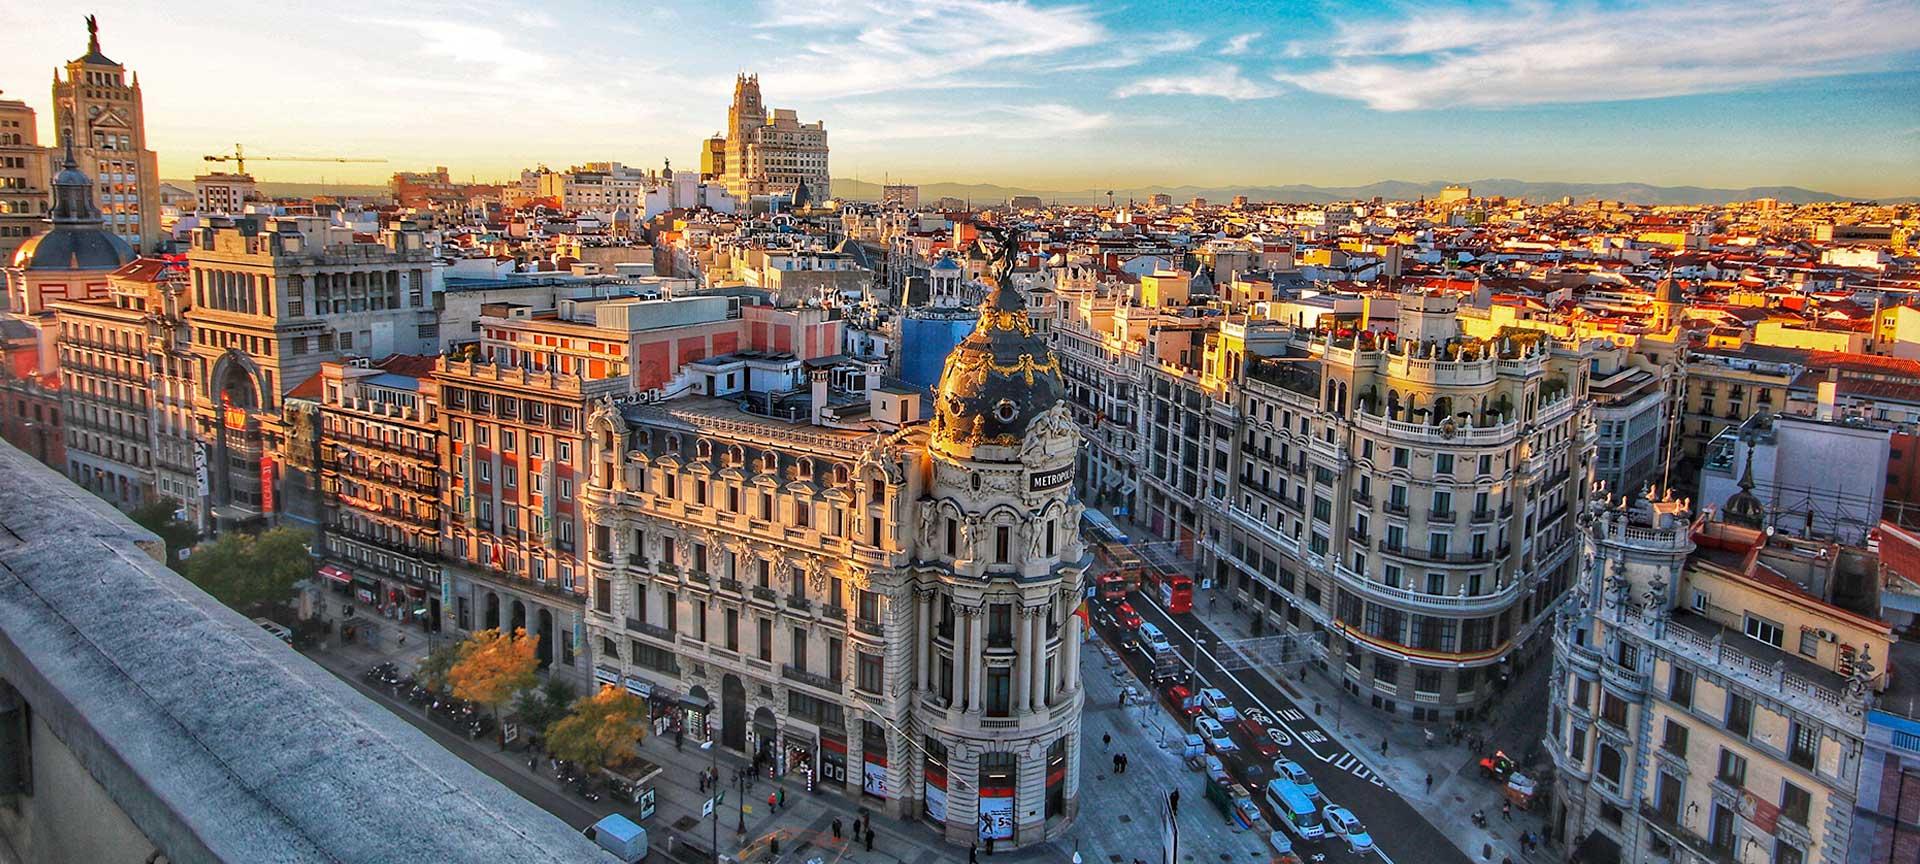 Centro de Desintoxicación en Madrid